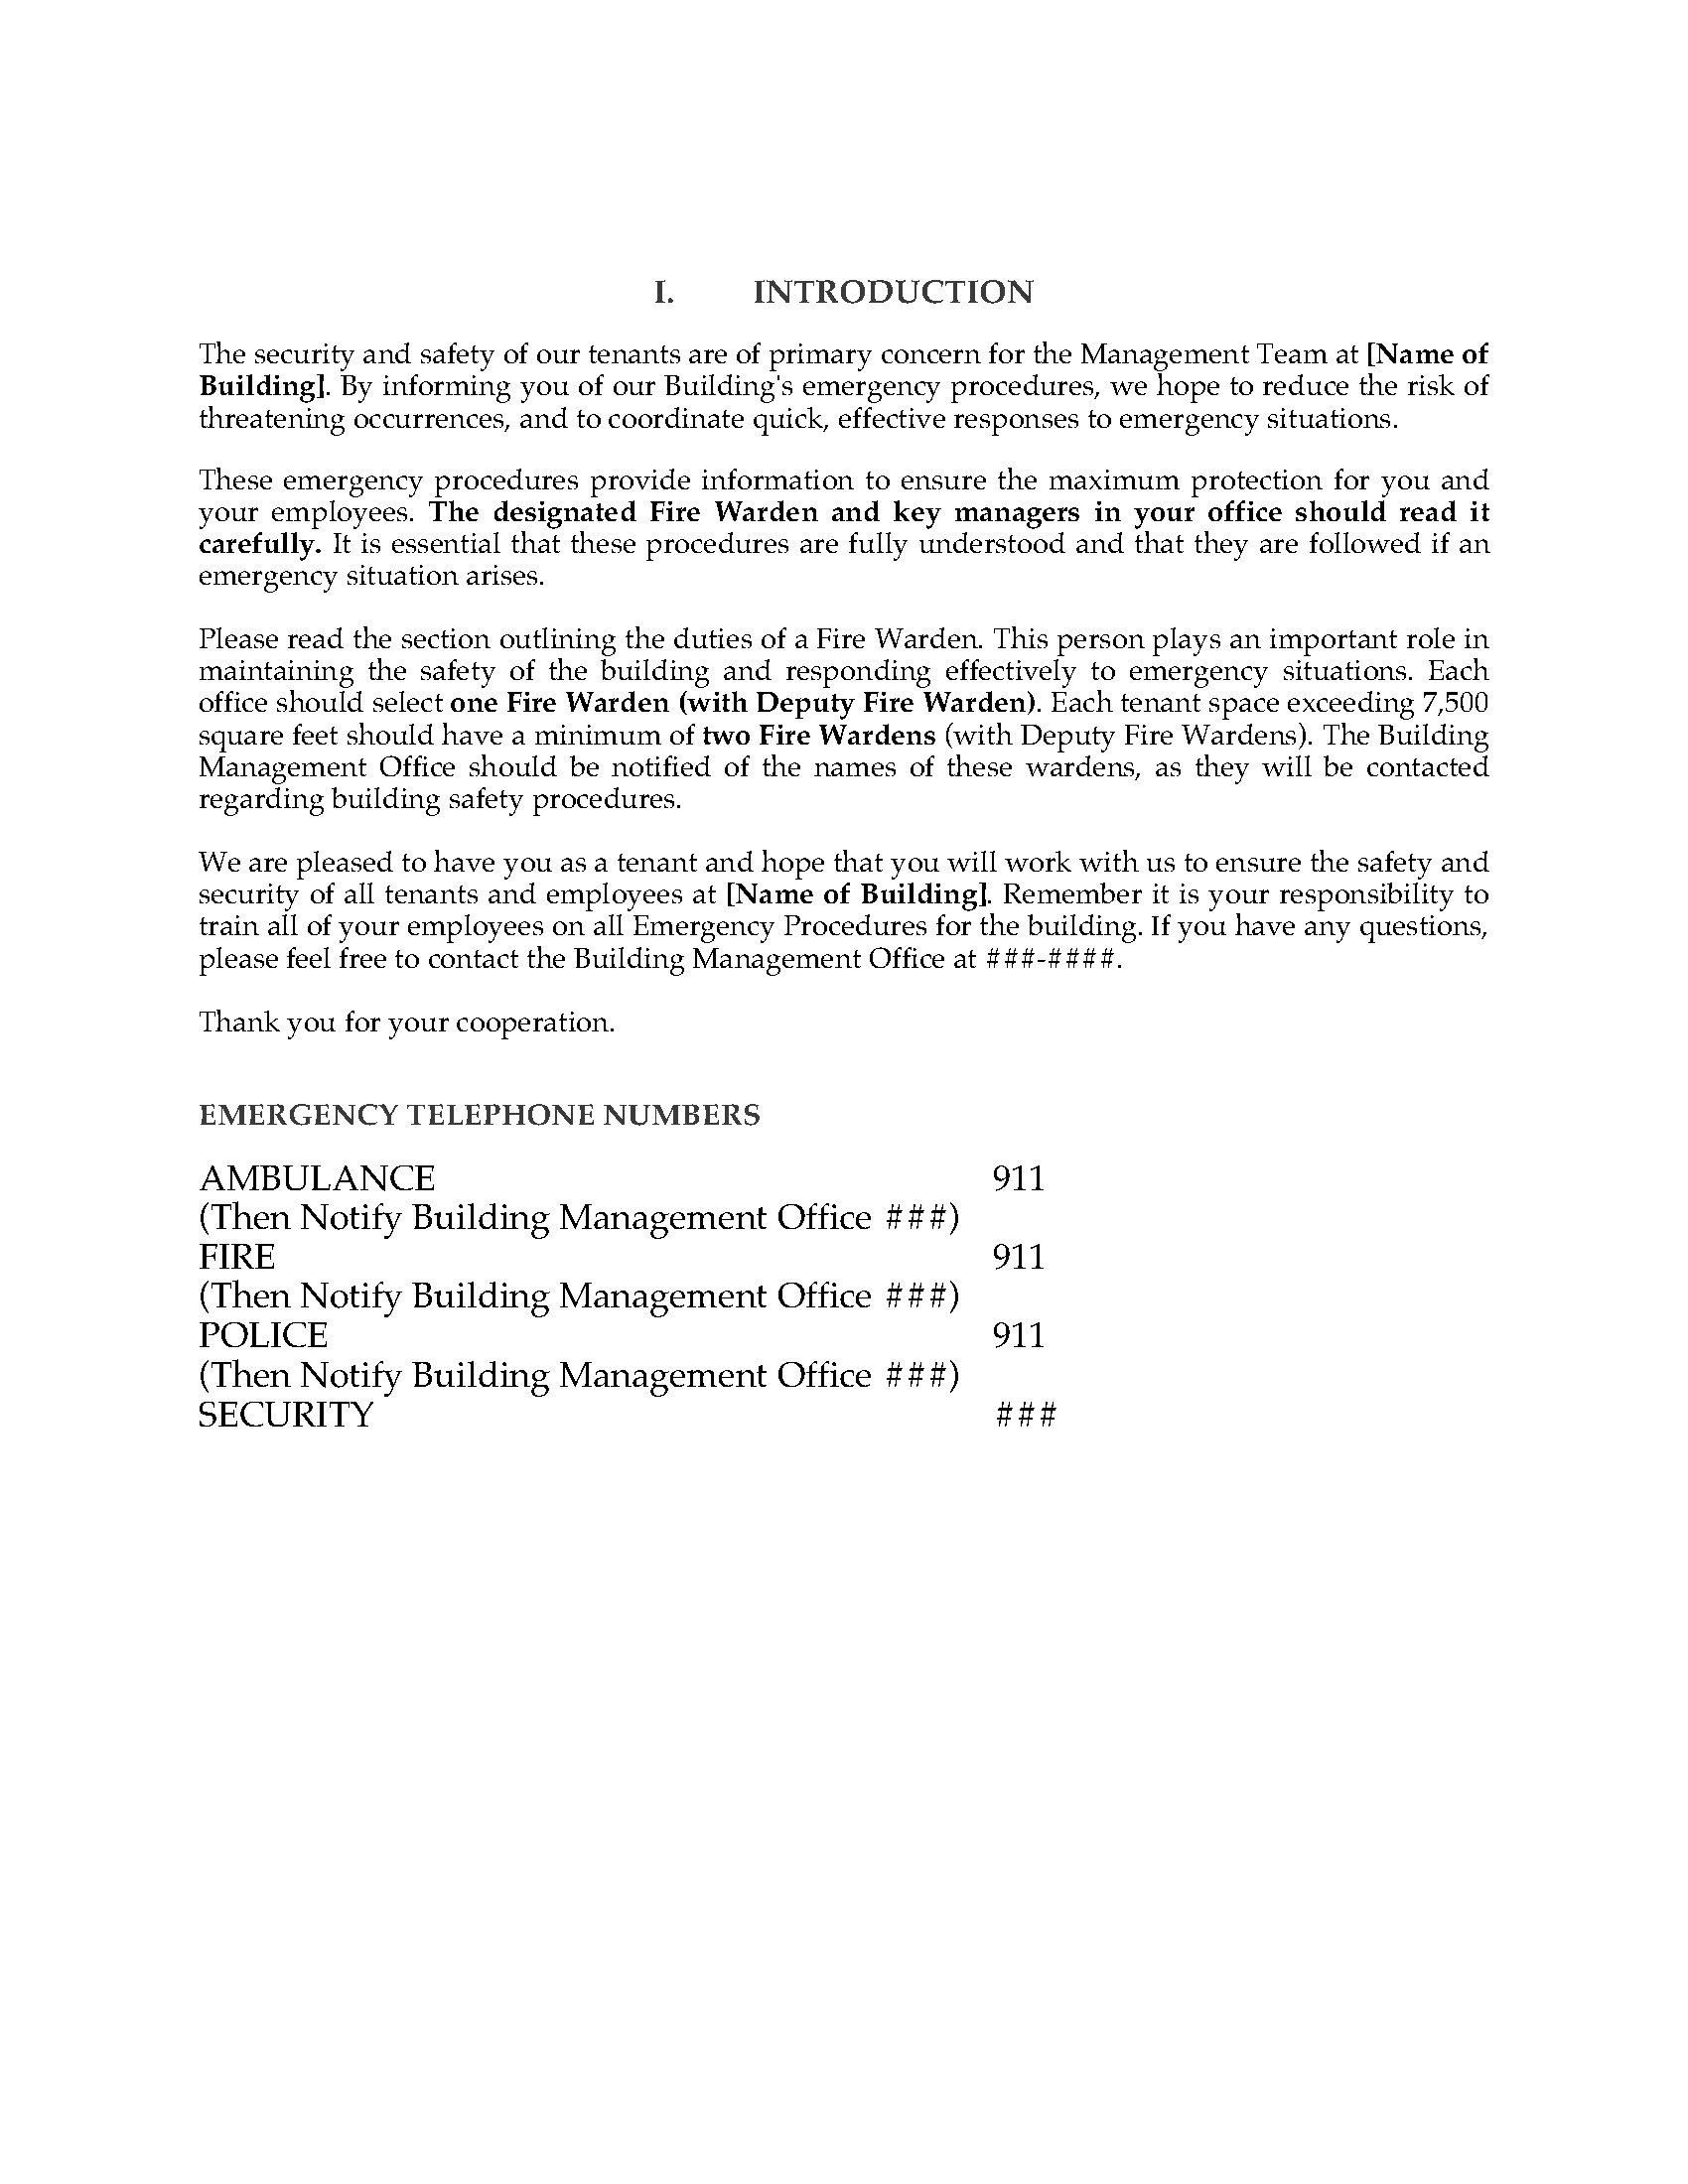 Commercial Tenant Emergency Procedures Manual